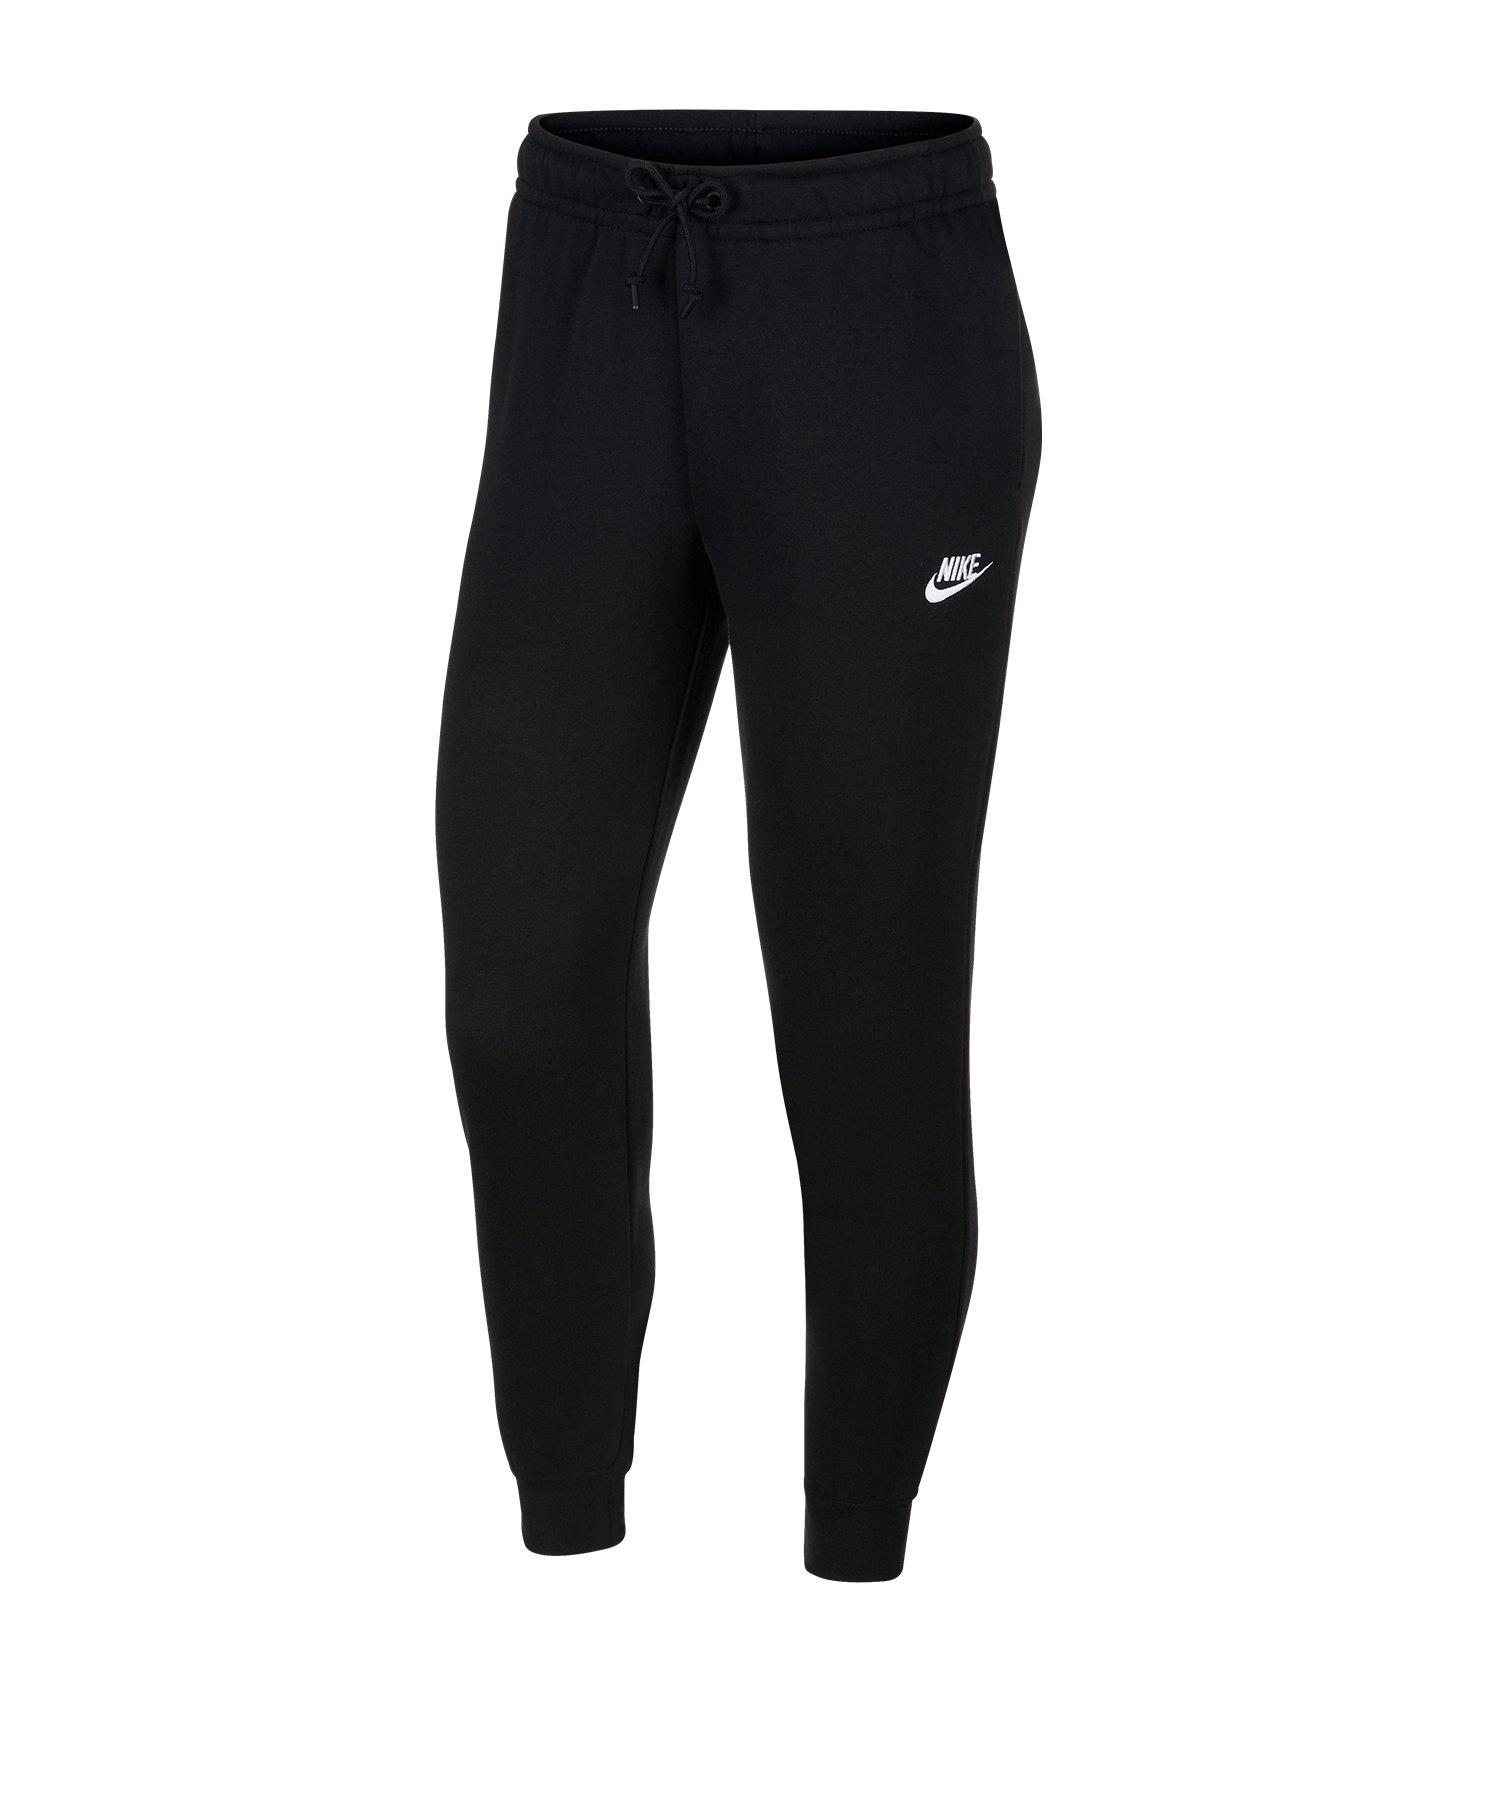 Nike Essential Fleece Jogginghose Damen F010 - schwarz